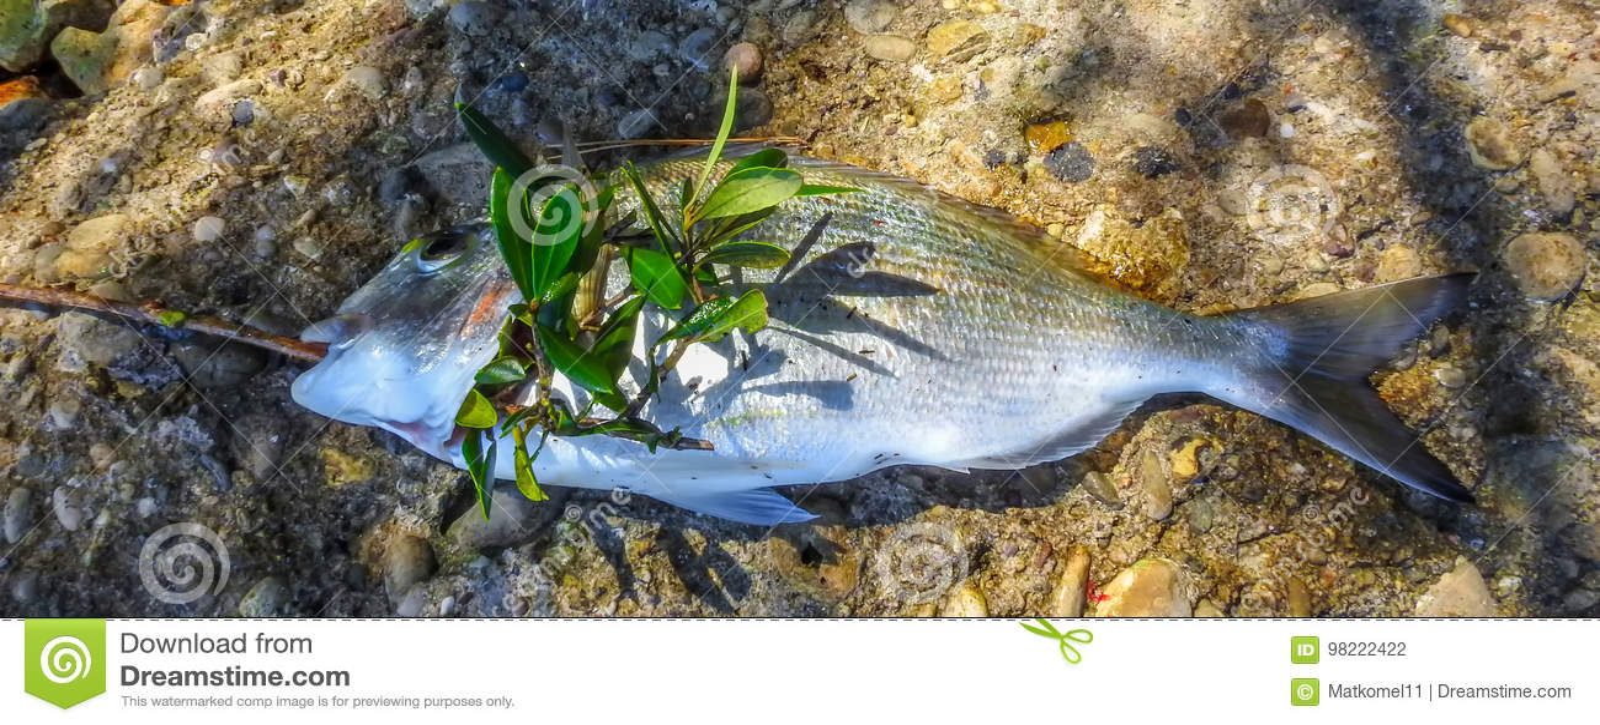 Vergoldungsgegenseebrachsenfische 2